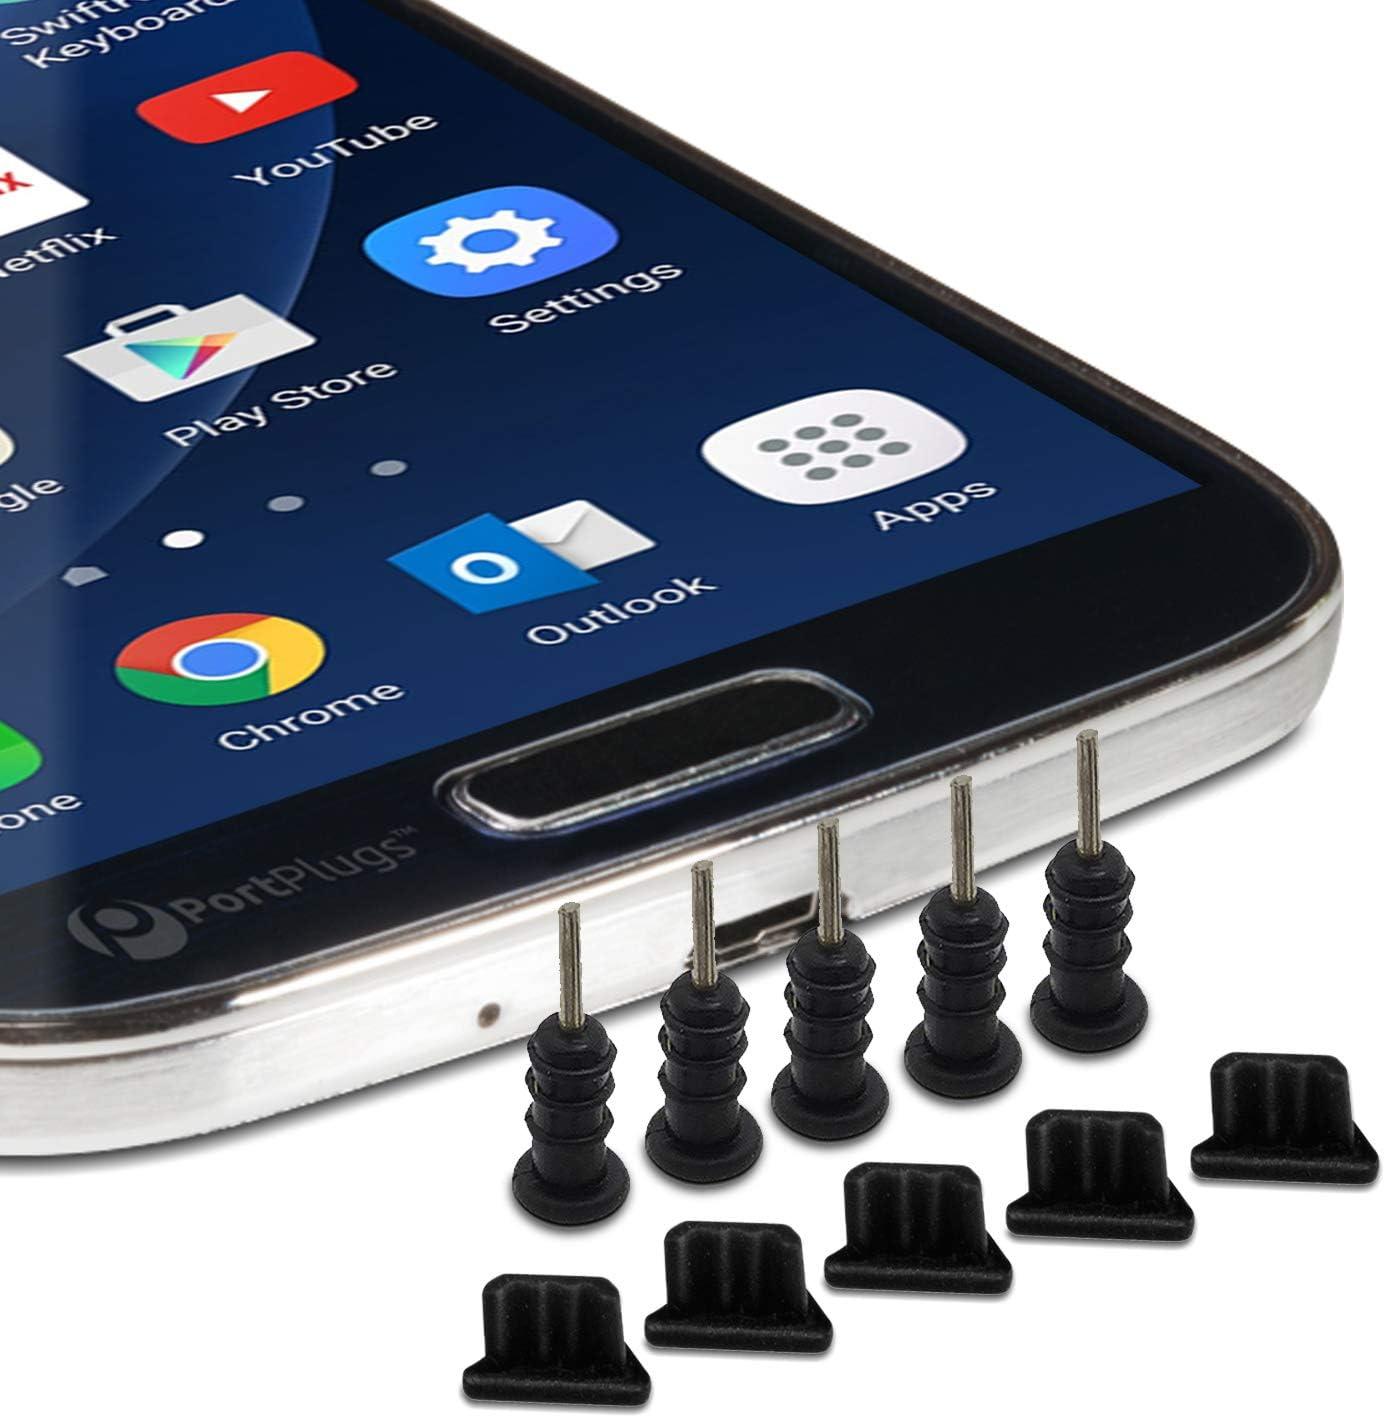 ULTECHNOVO 2pcs Silicone Anti-dust Plug Set Headphone Jack Cell Phone Dust Plug Micro USB Charging Port and Earphone Jack Anti Dust Pluggy Caps